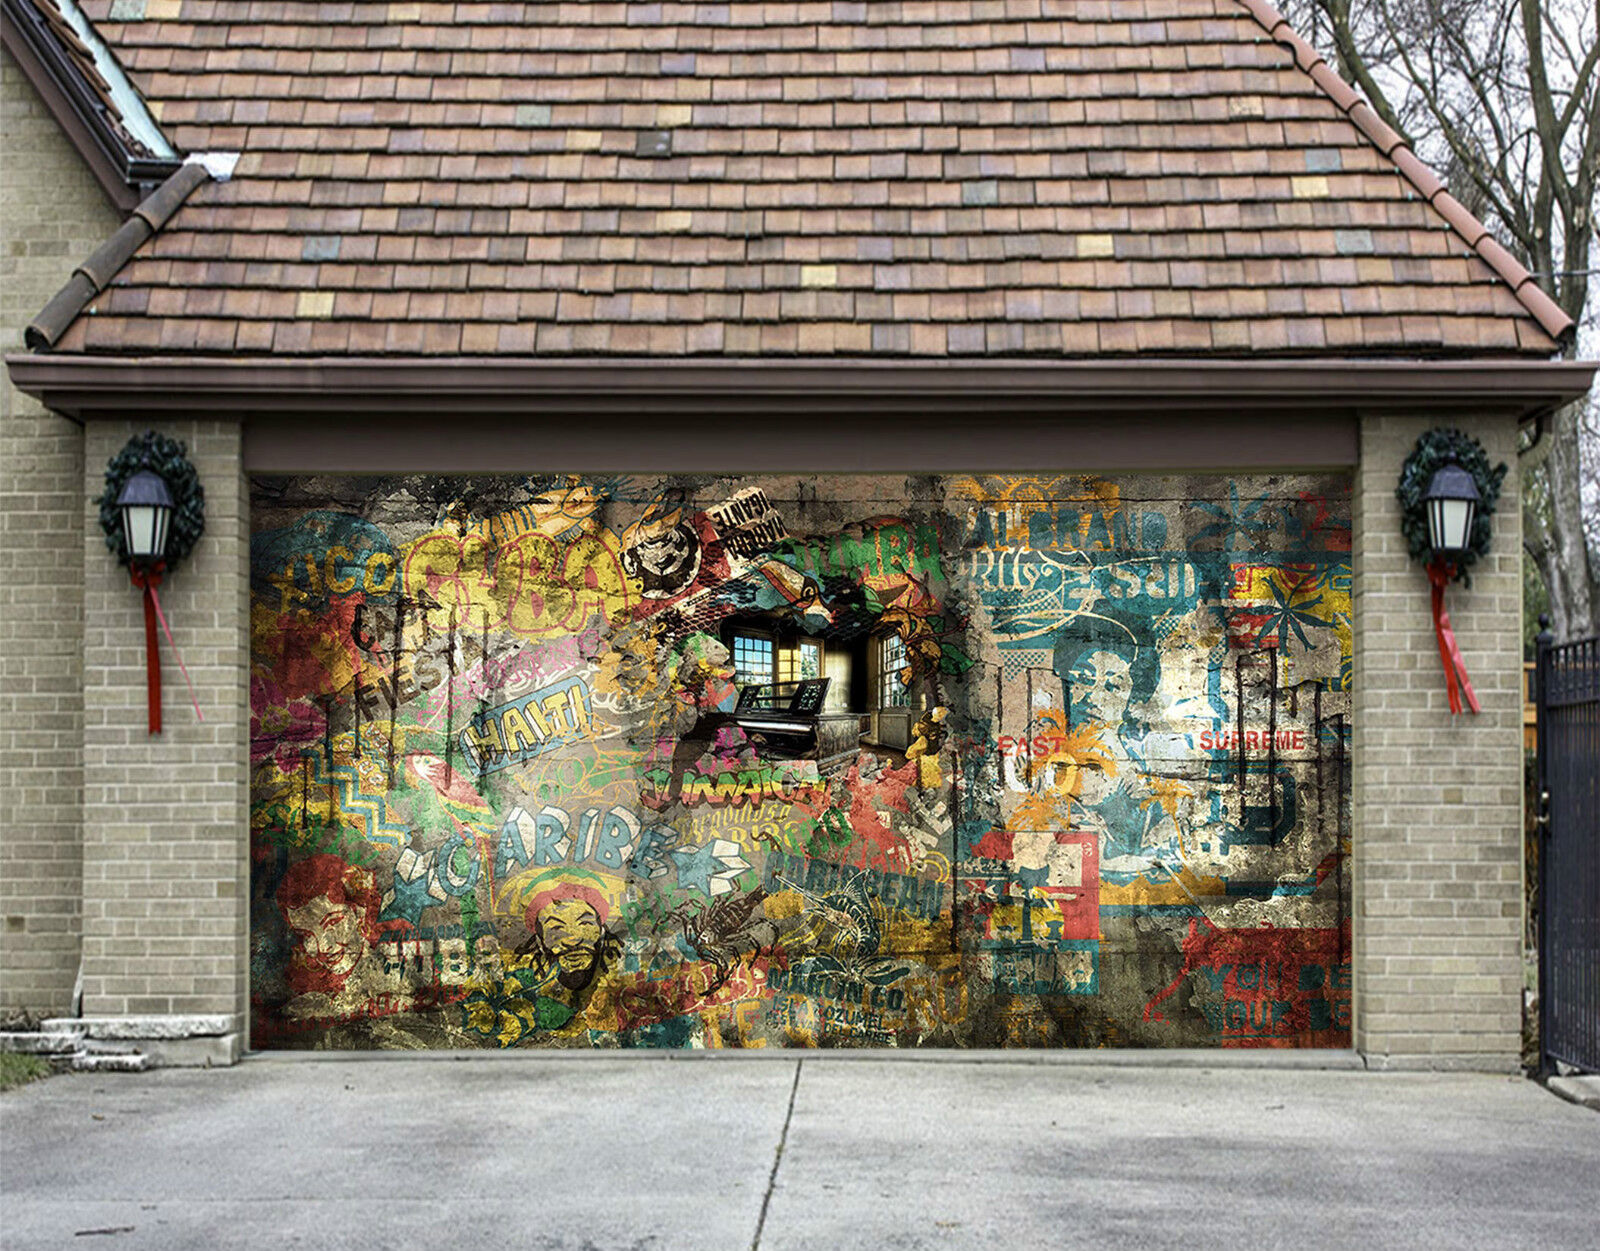 3D Blurry Graffiti Garage Door Murals Wall Print Decal Wall Deco AJ WALLPAPER IE